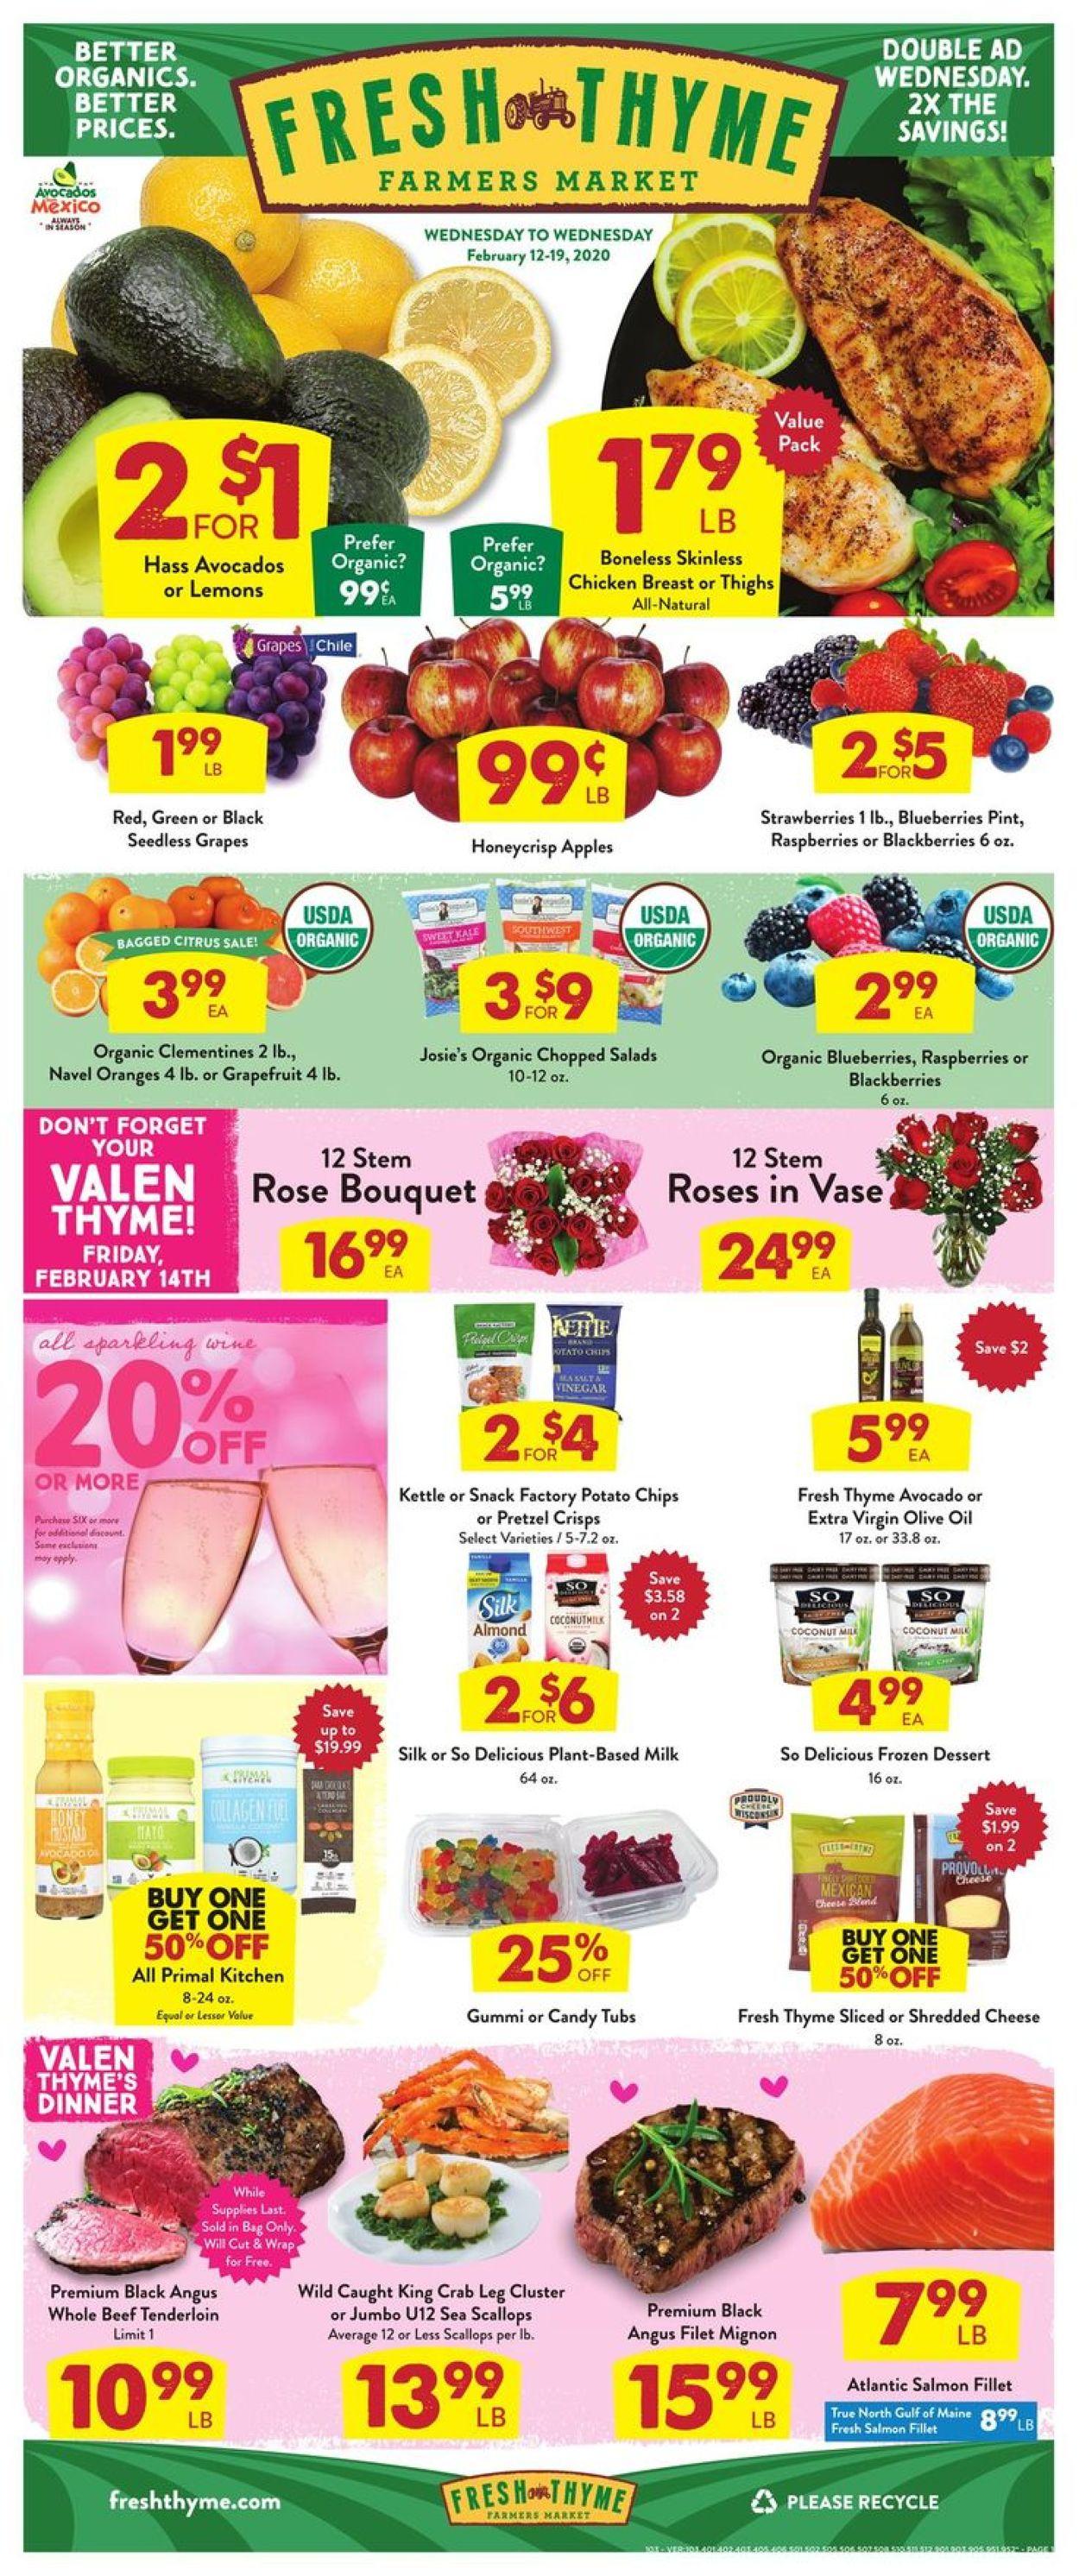 Fresh Thyme Weekly Ad Circular - valid 02/12-02/19/2020